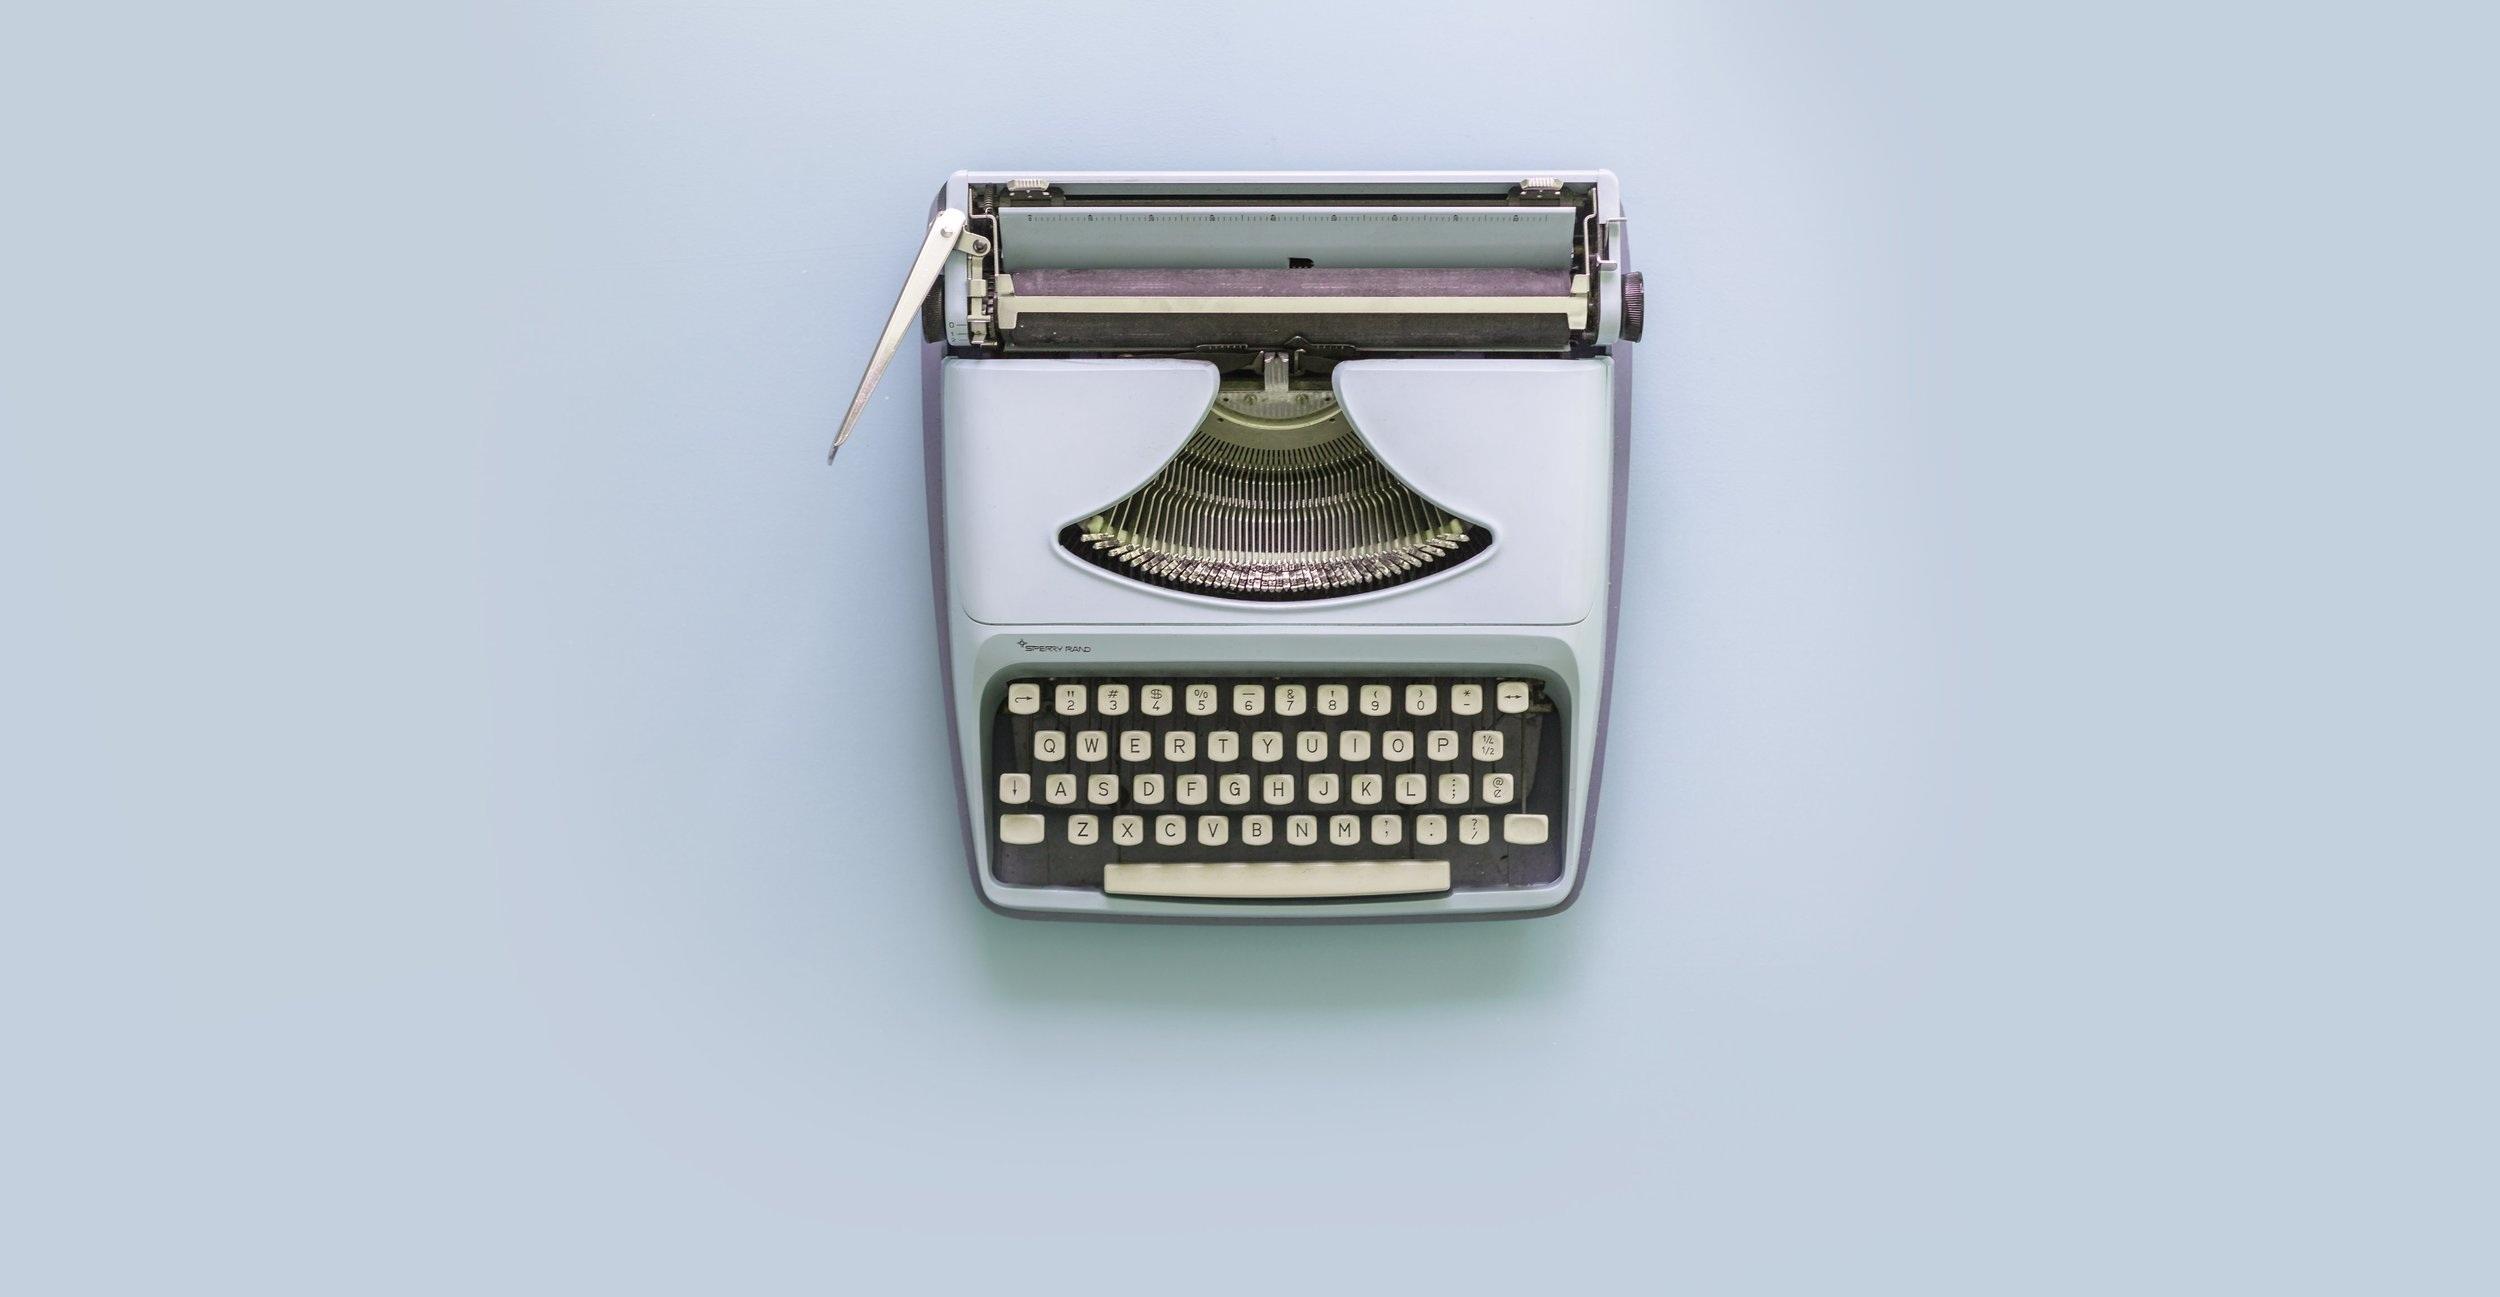 light-blue-typewriter_4460x4460.jpg